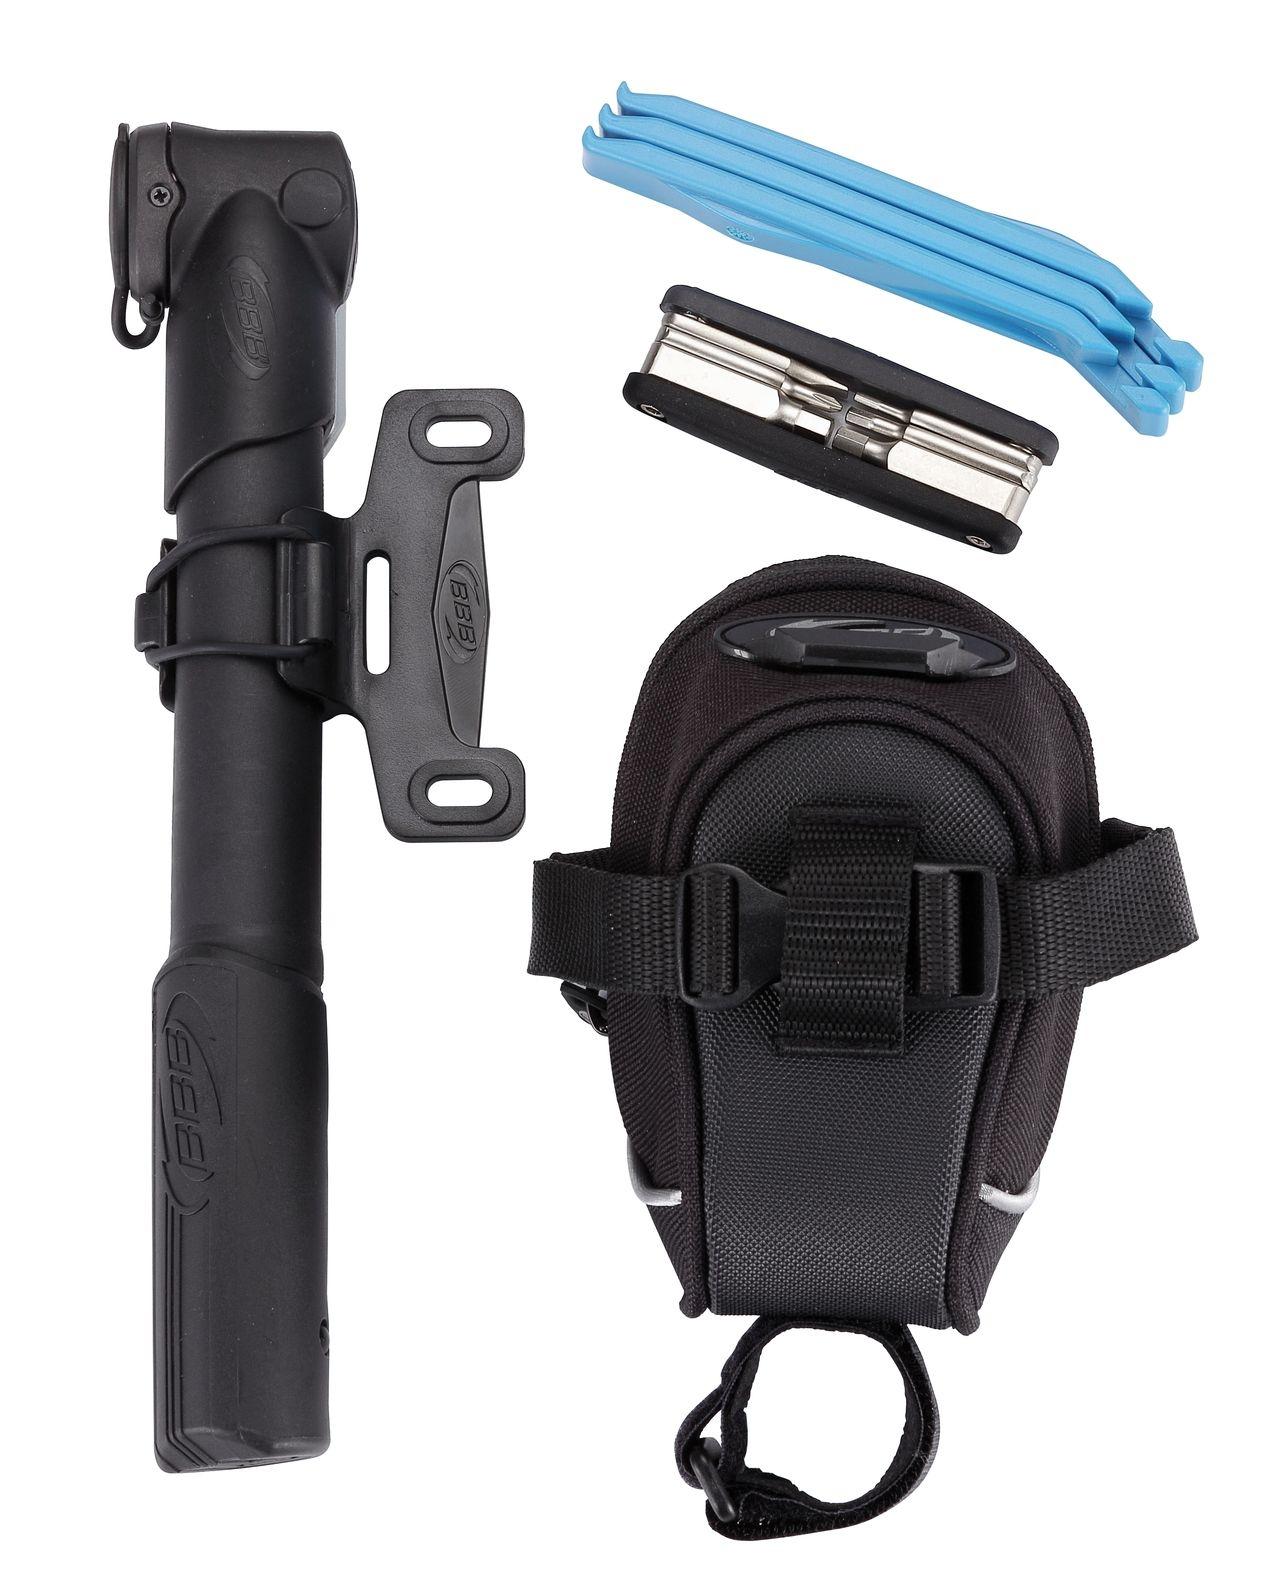 Kit sacoche de selle + pompe + outils BBB Saddlebag Combi S - BSB-51